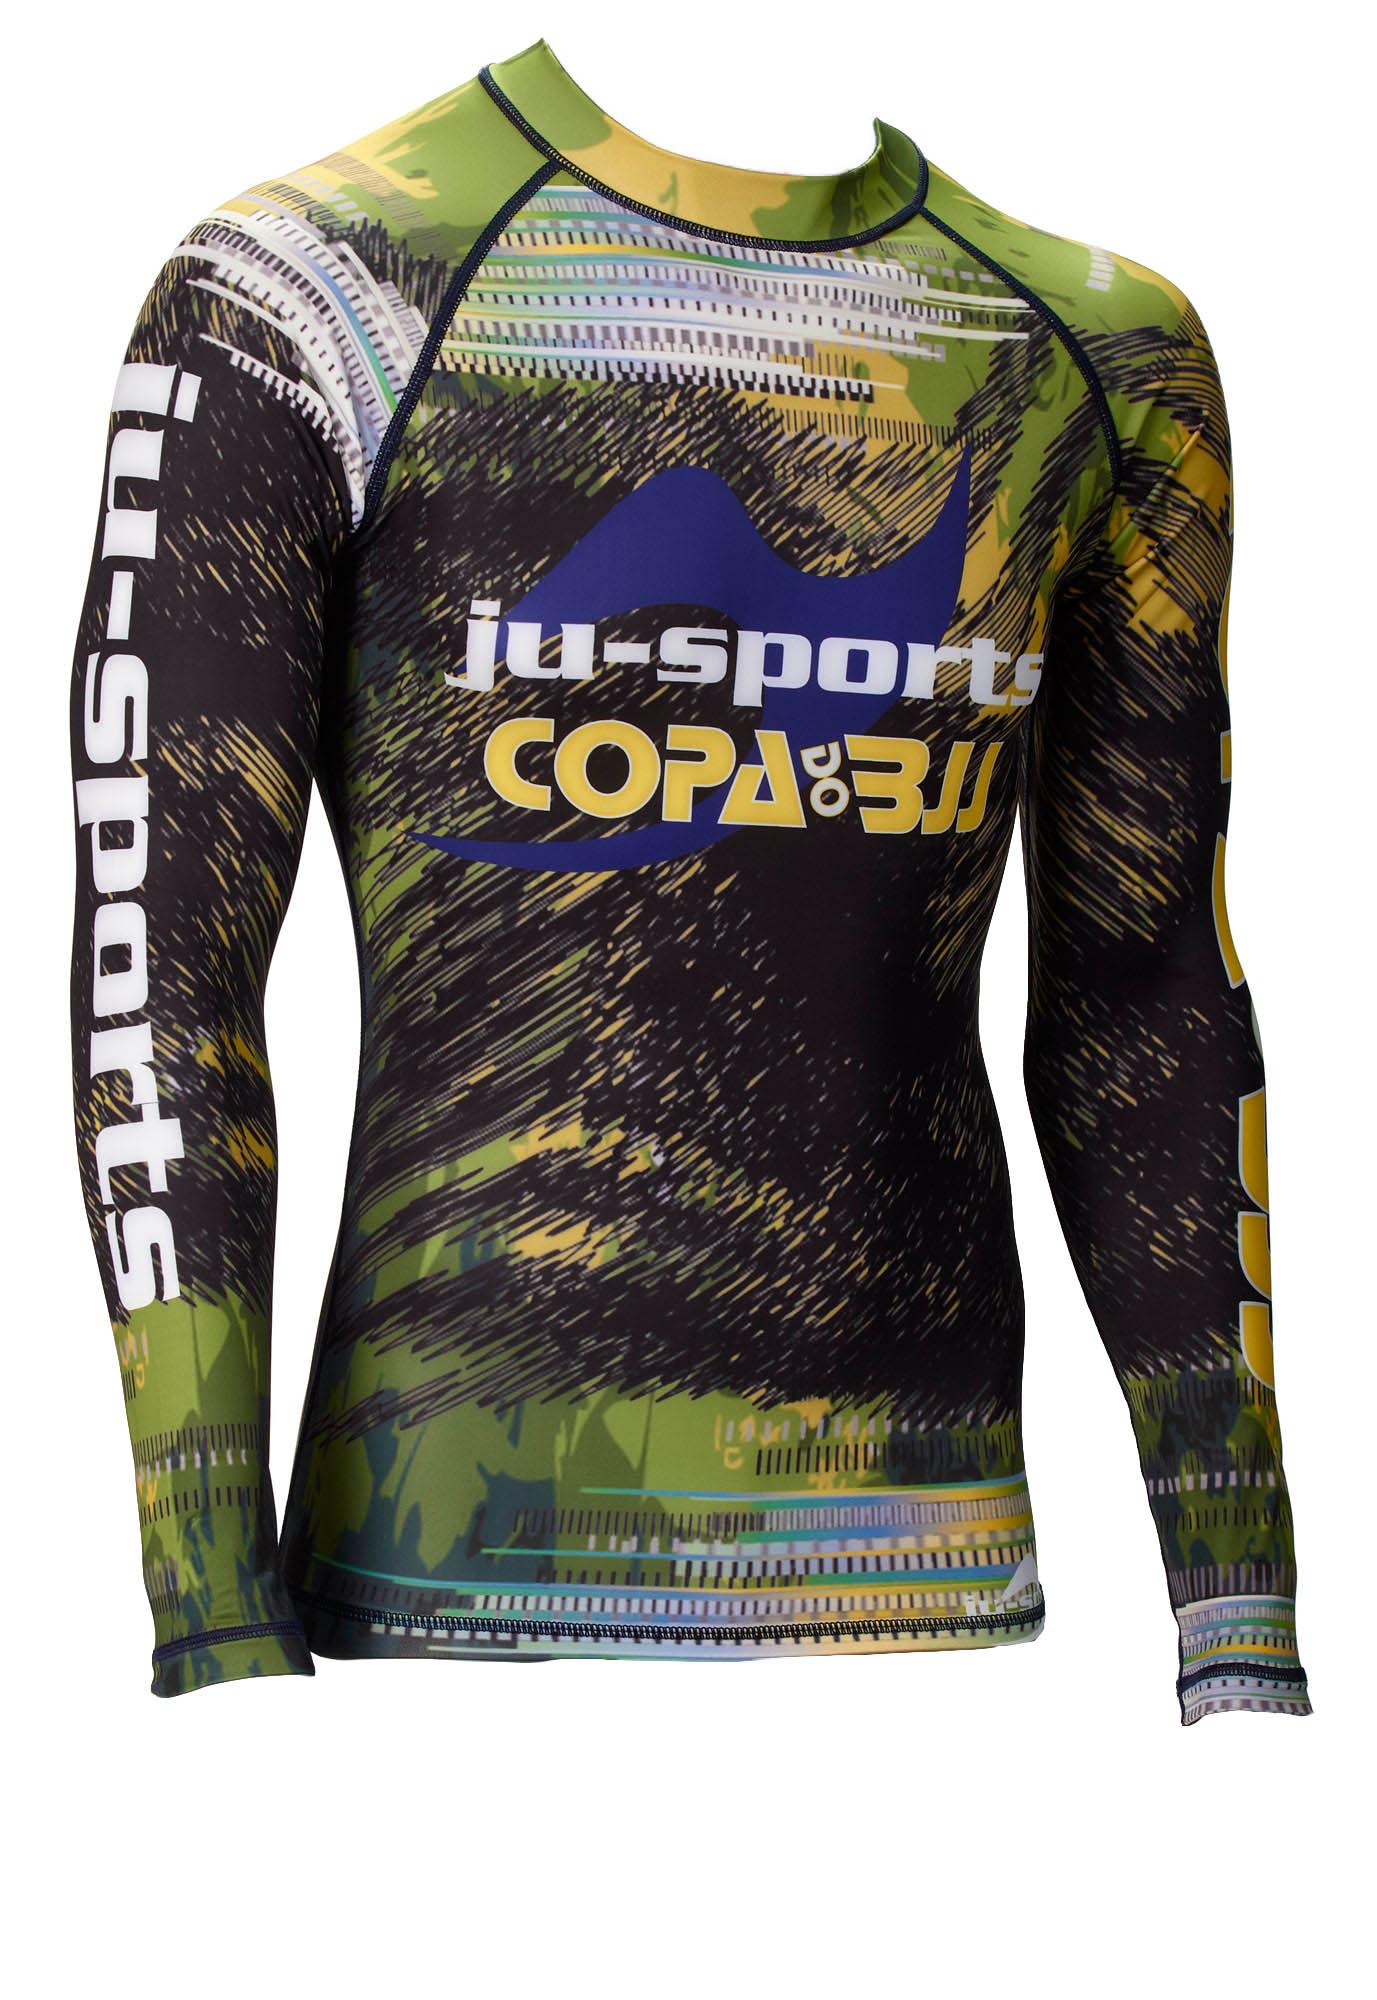 Limited Edition Rash Guard 'Copa do BJJ'